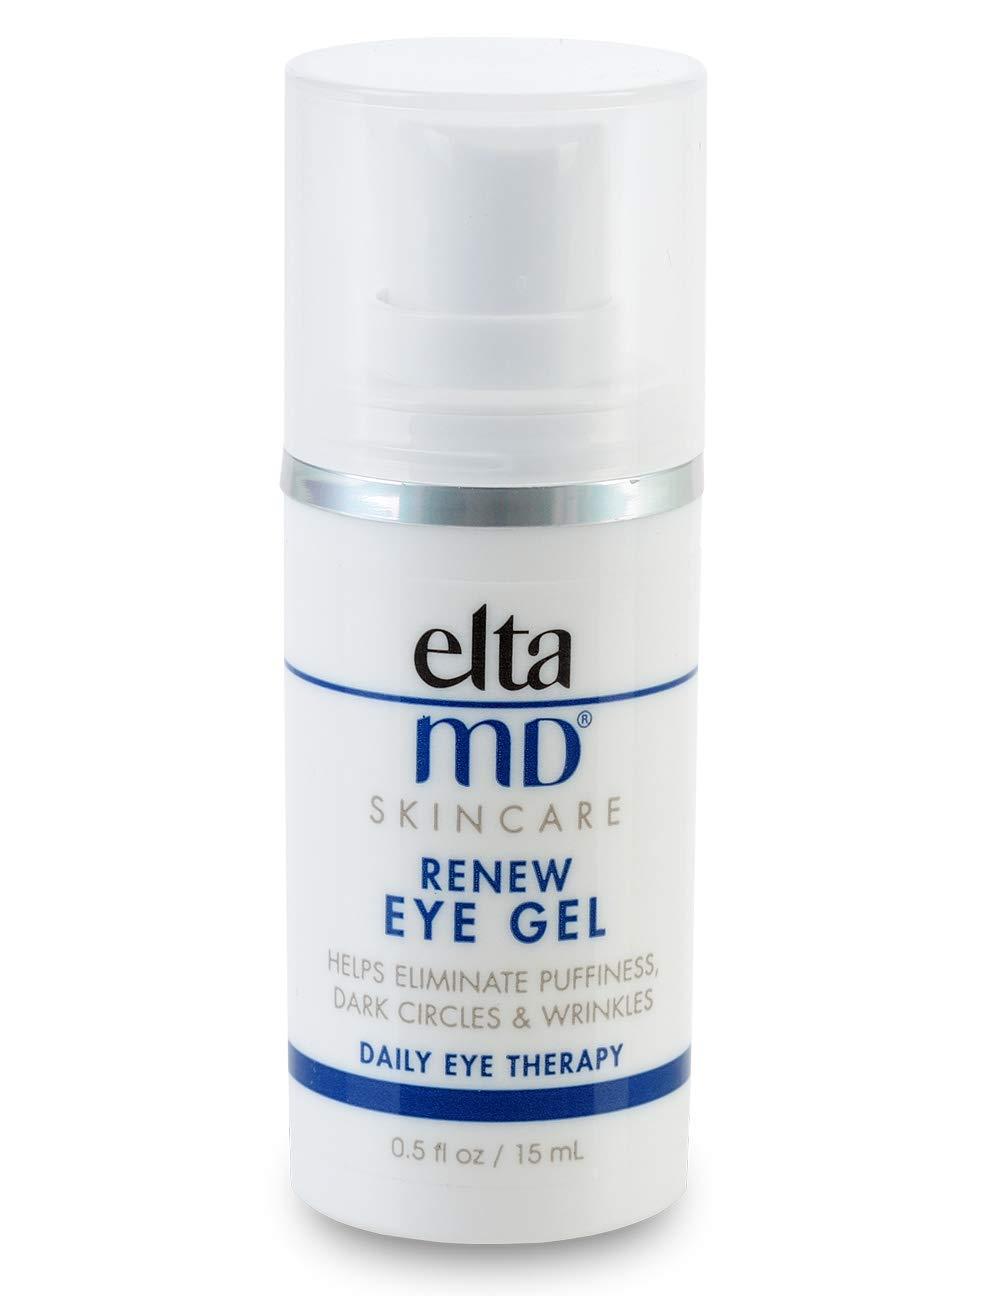 EltaMD Renew Eye Gel for Dark Circles, Fine Lines Around Eyes, Clinically-Proven Eye Cream, Oil-free, 0.5 oz by ELTA MD